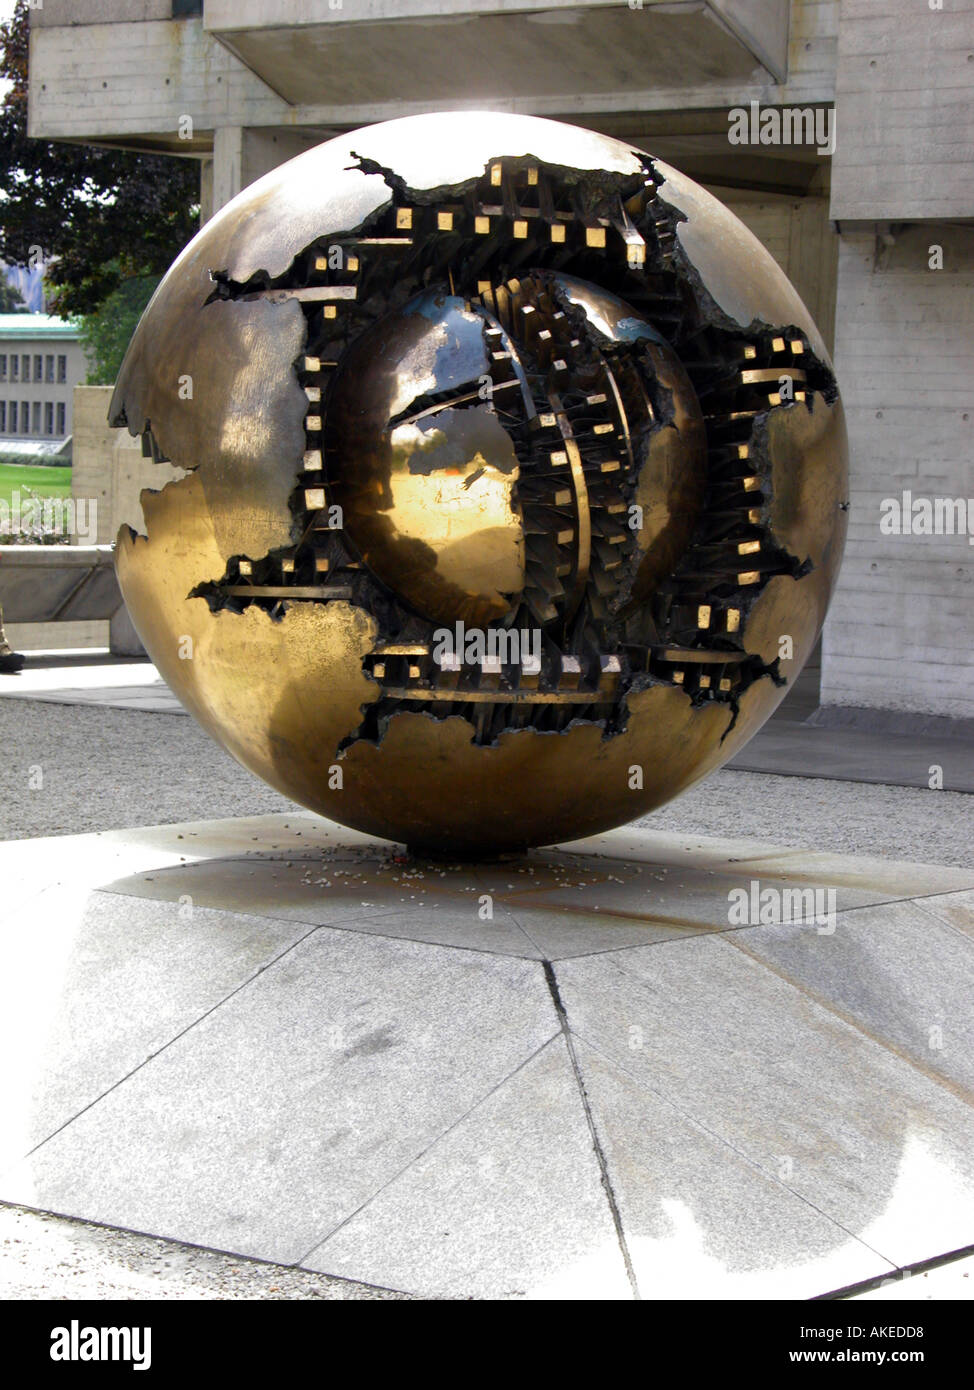 Copy of Sfera Conserva conservation Sphere sculpture Trinity College Dublin Republic of Ireland the original is - Stock Image